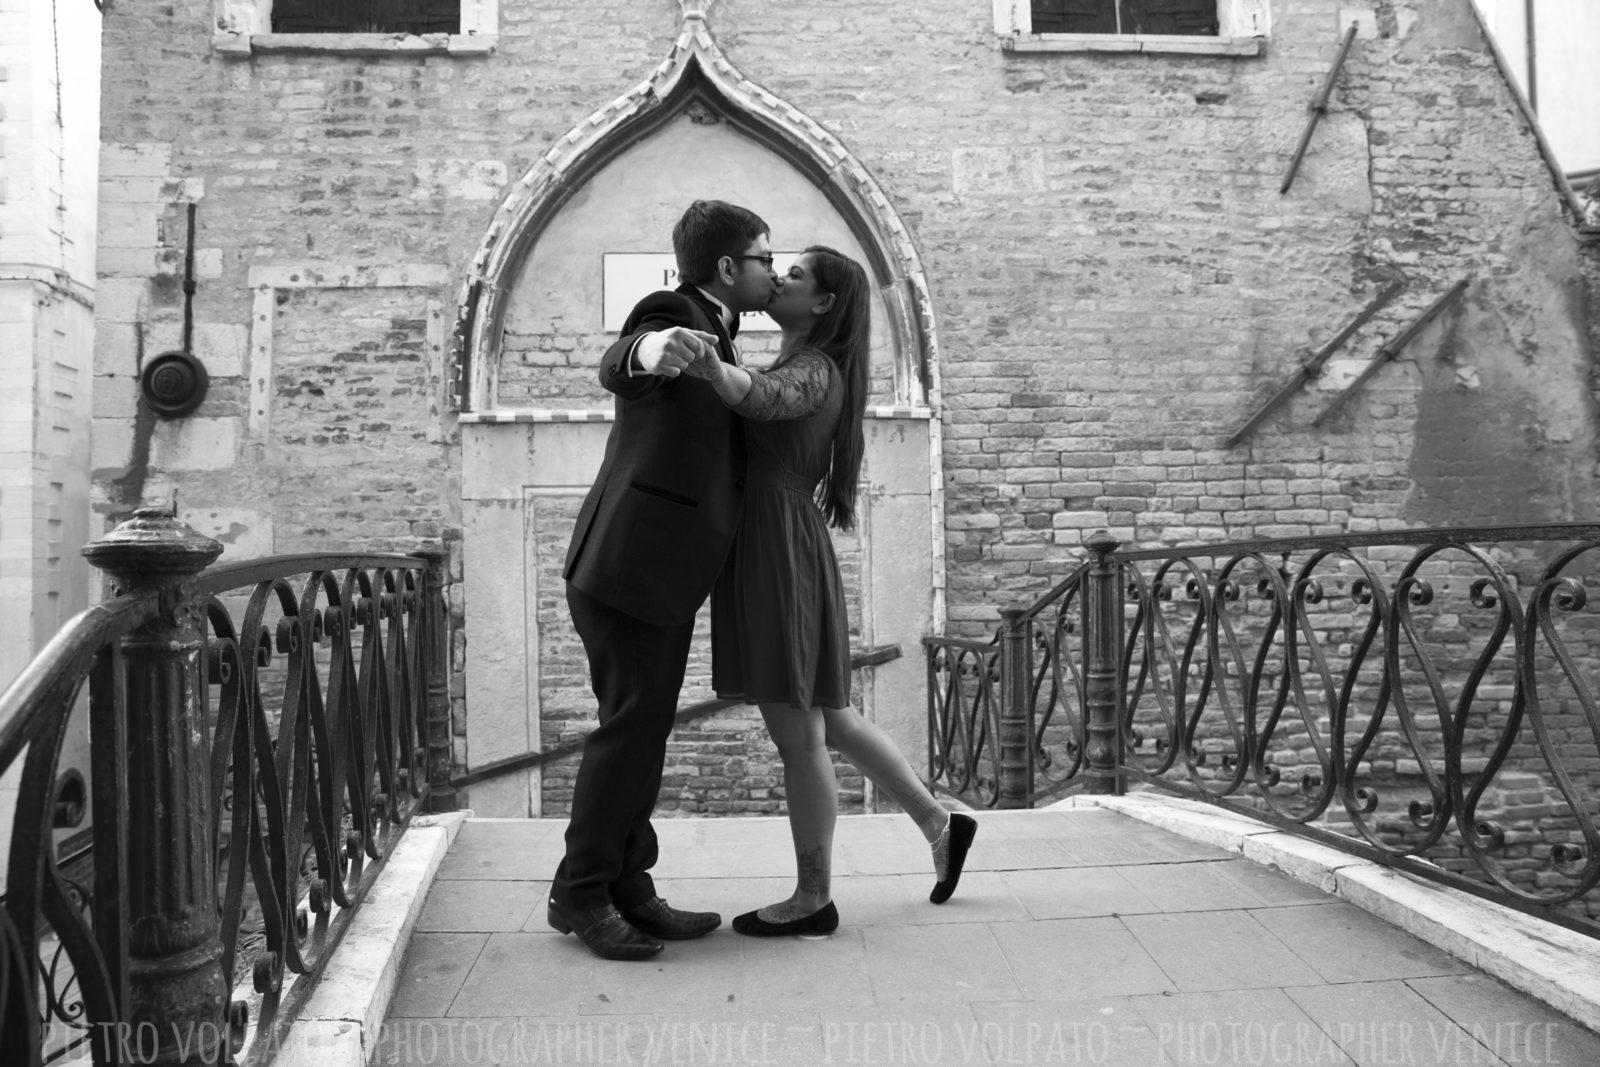 photographer-venice-italy-honeymoon-photo-shoot-romantic-fun-walking-tour-20160429_05